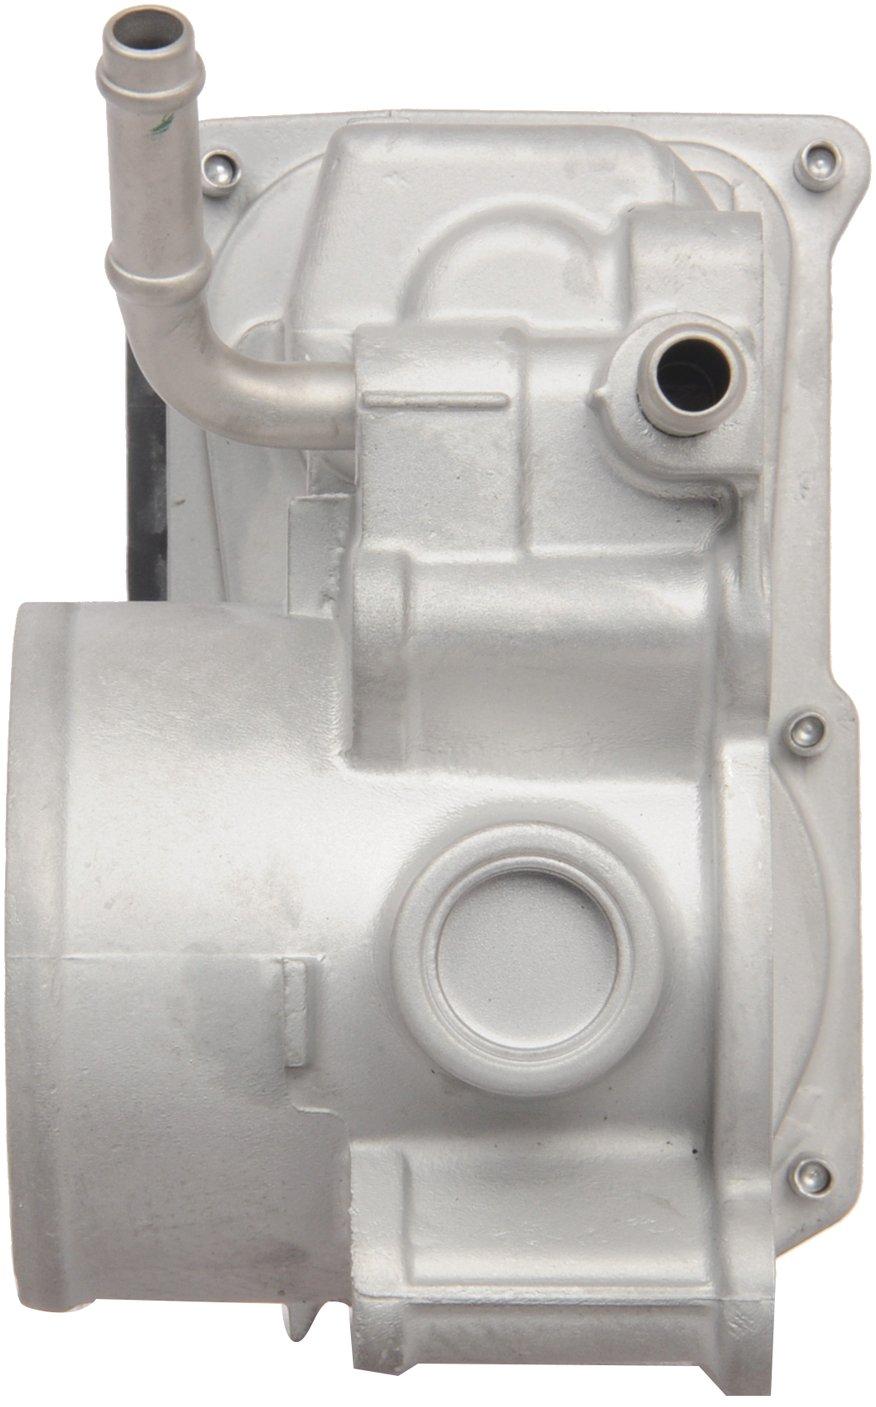 medium resolution of 2006 pontiac vibe fuel injection throttle body a1 67 8003